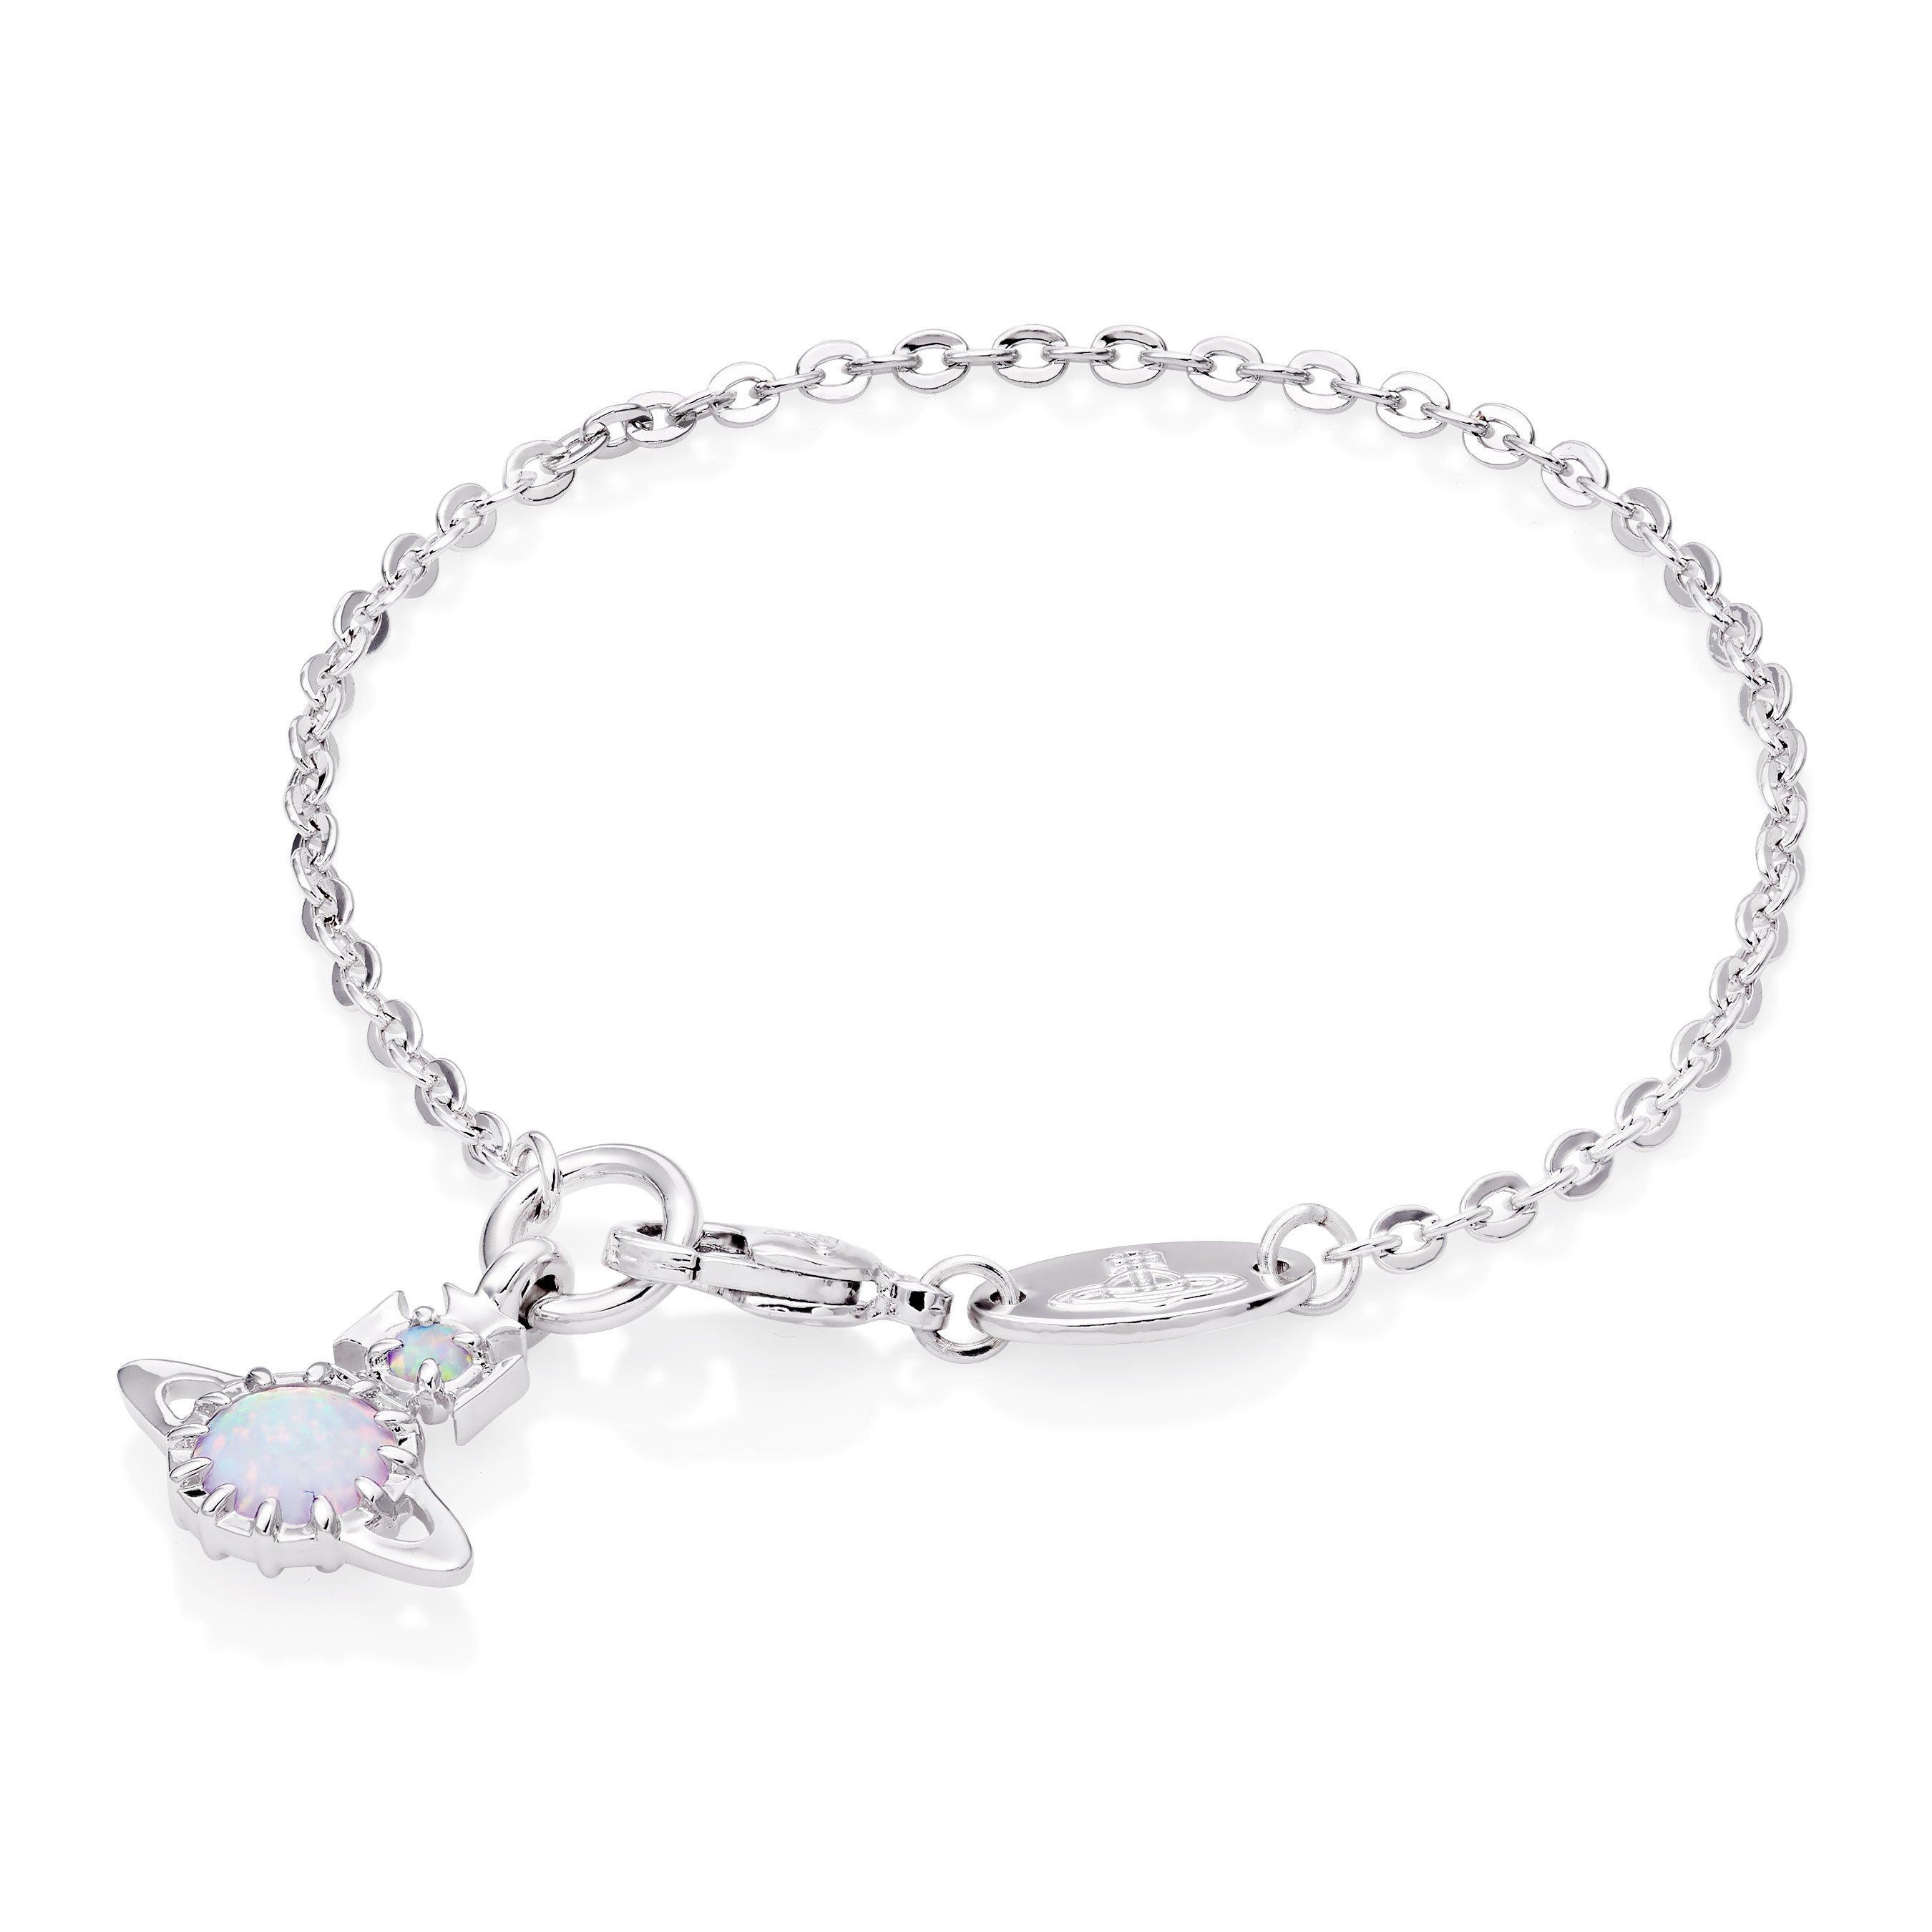 Vivienne Westwood Latifah Silver Tone Bracelet